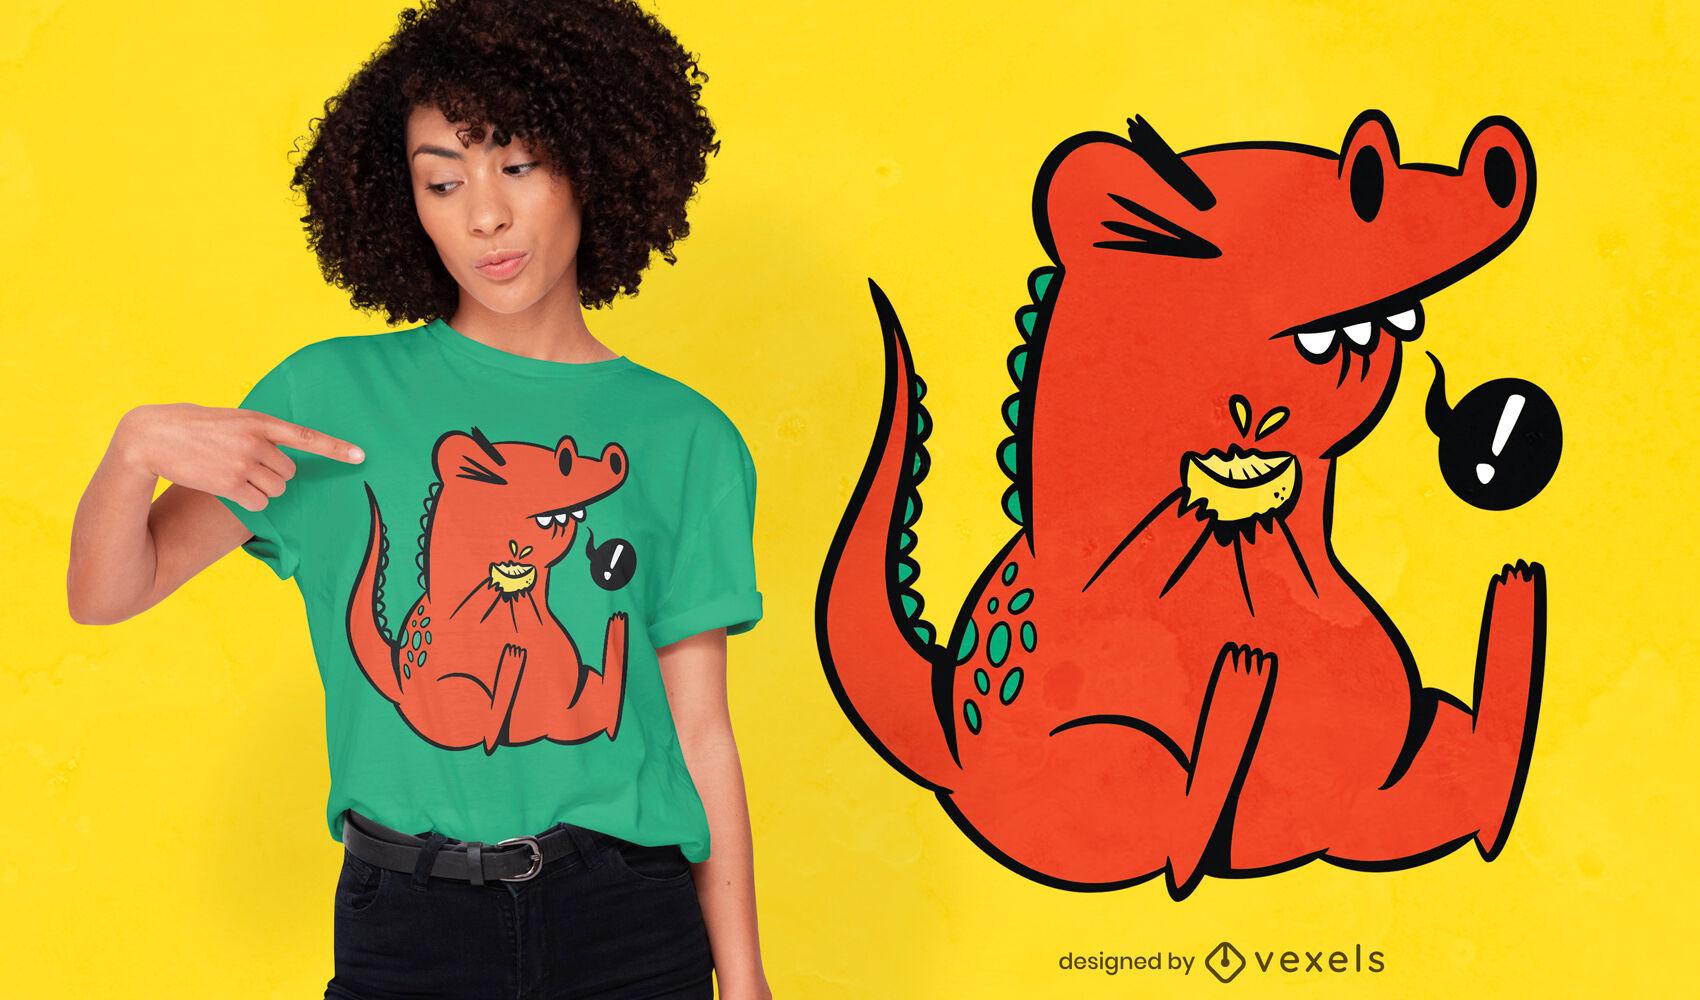 Diseño de camiseta de dibujos animados de dinosaurio comiendo limón